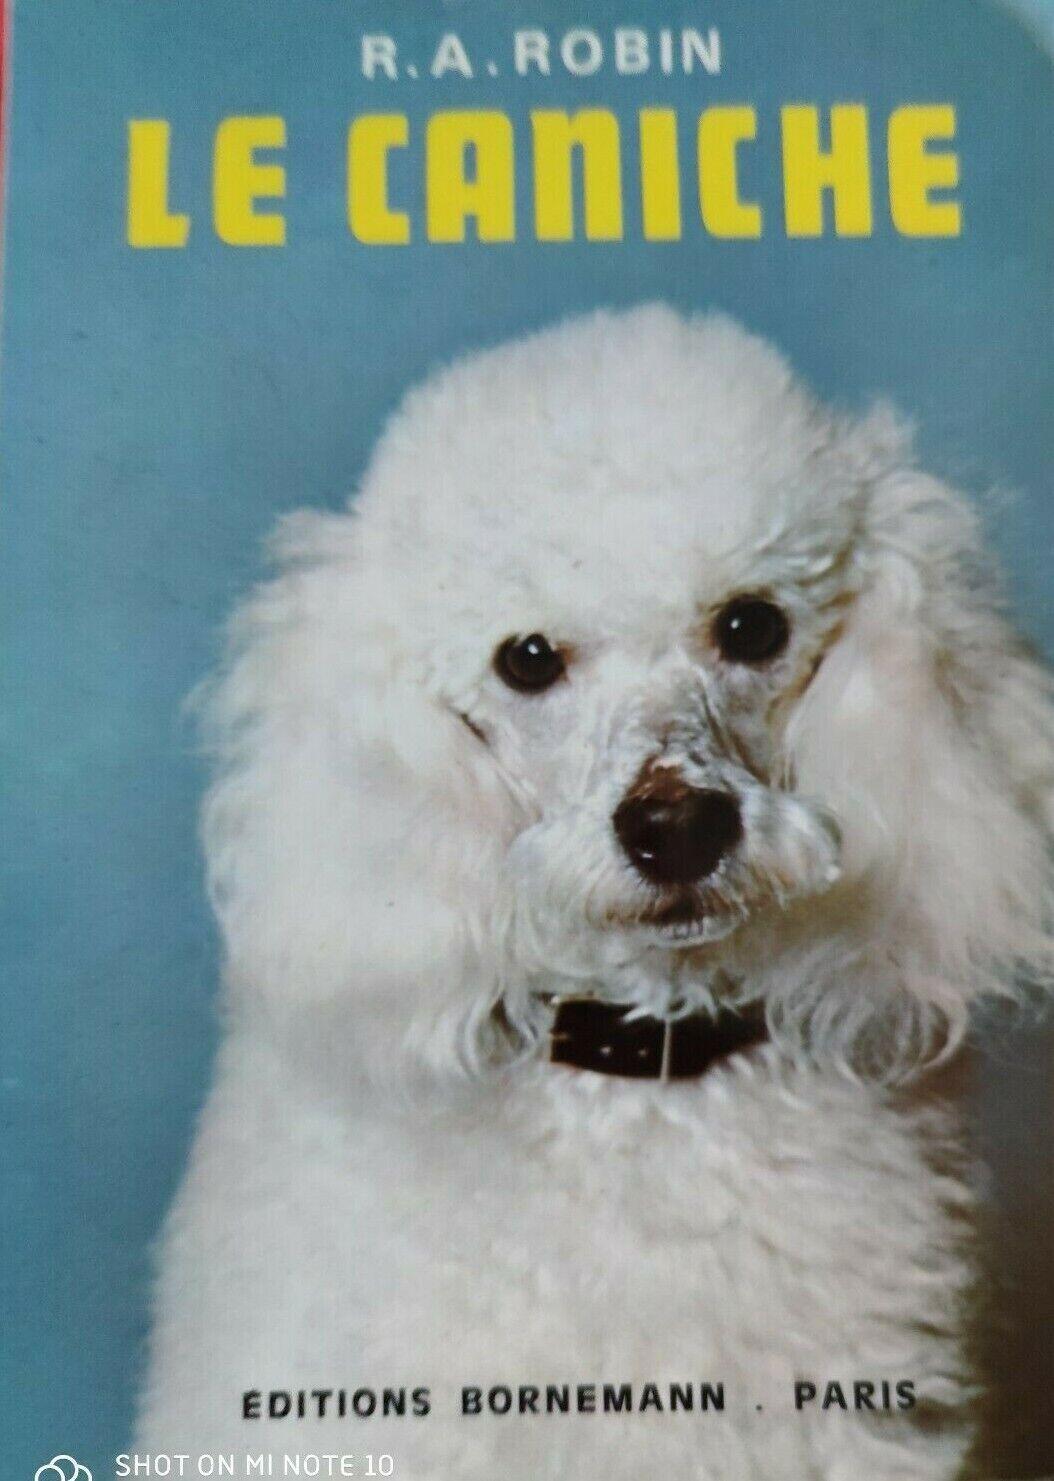 Chiens: le caniche - r.a. robin + les caniches - philippe de wailly